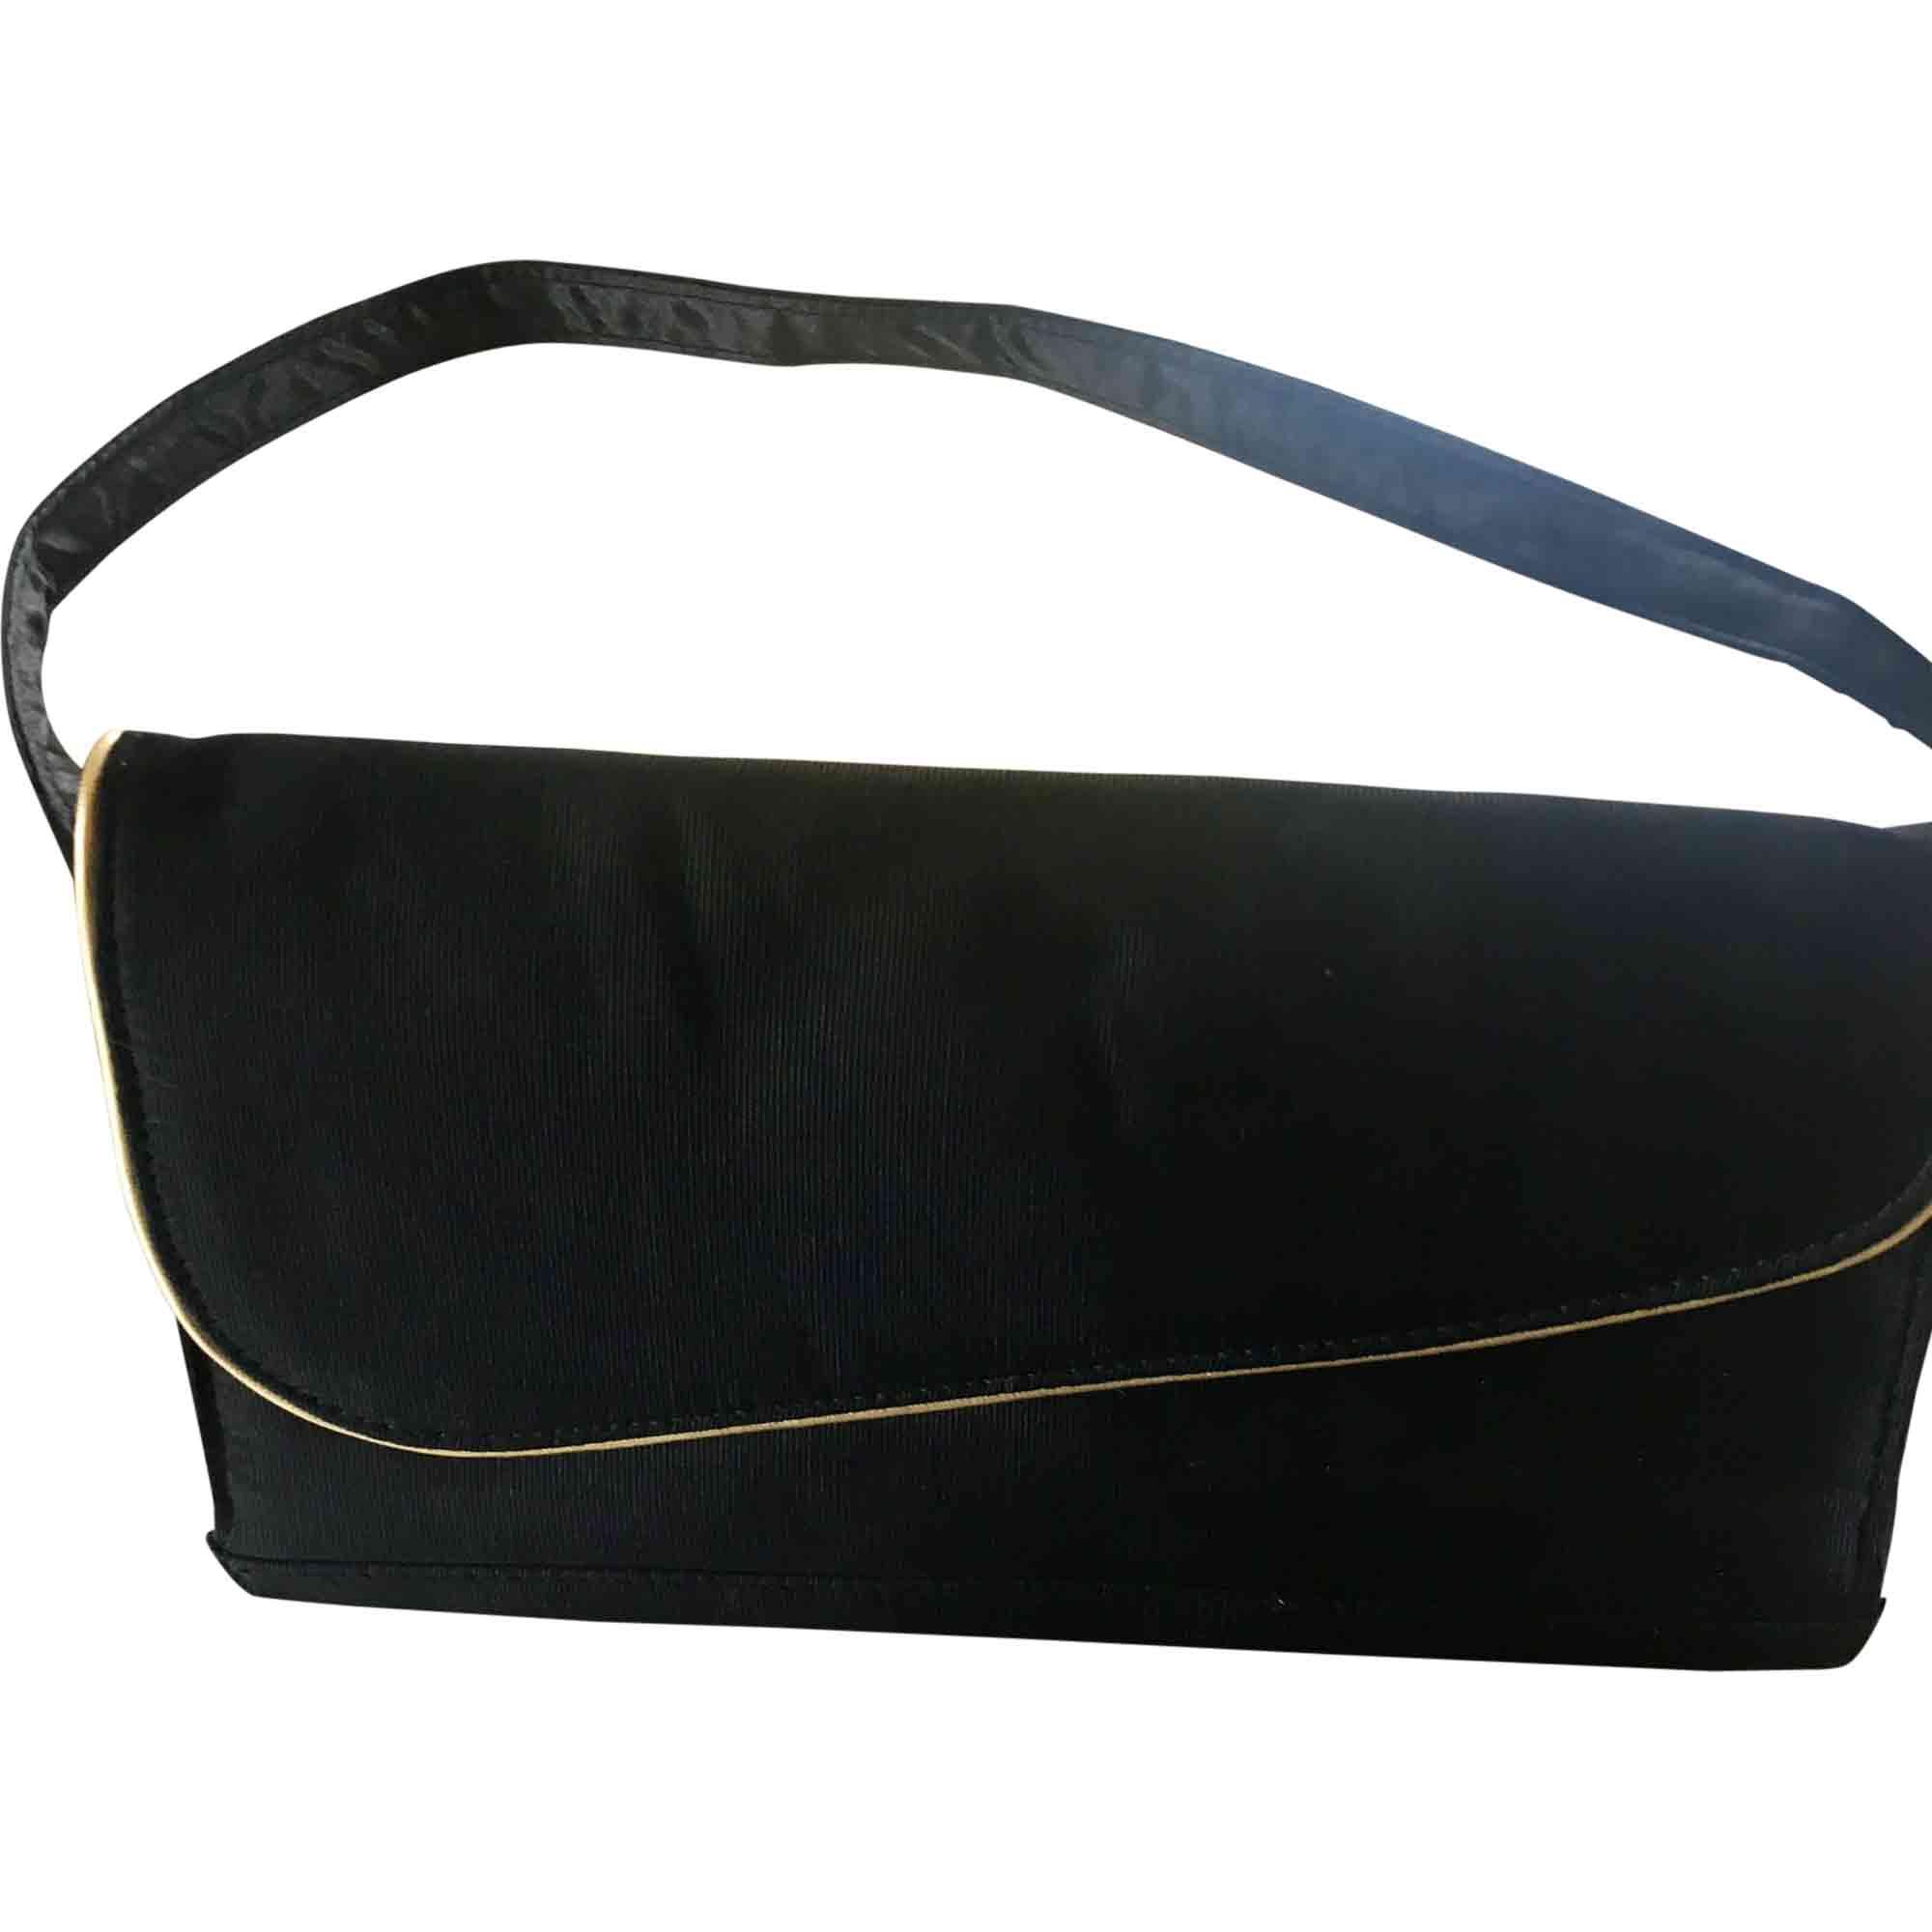 Noir Sac Tissu Van Pochette Arpels Cleefamp; En 5817382 7ygf6vbY